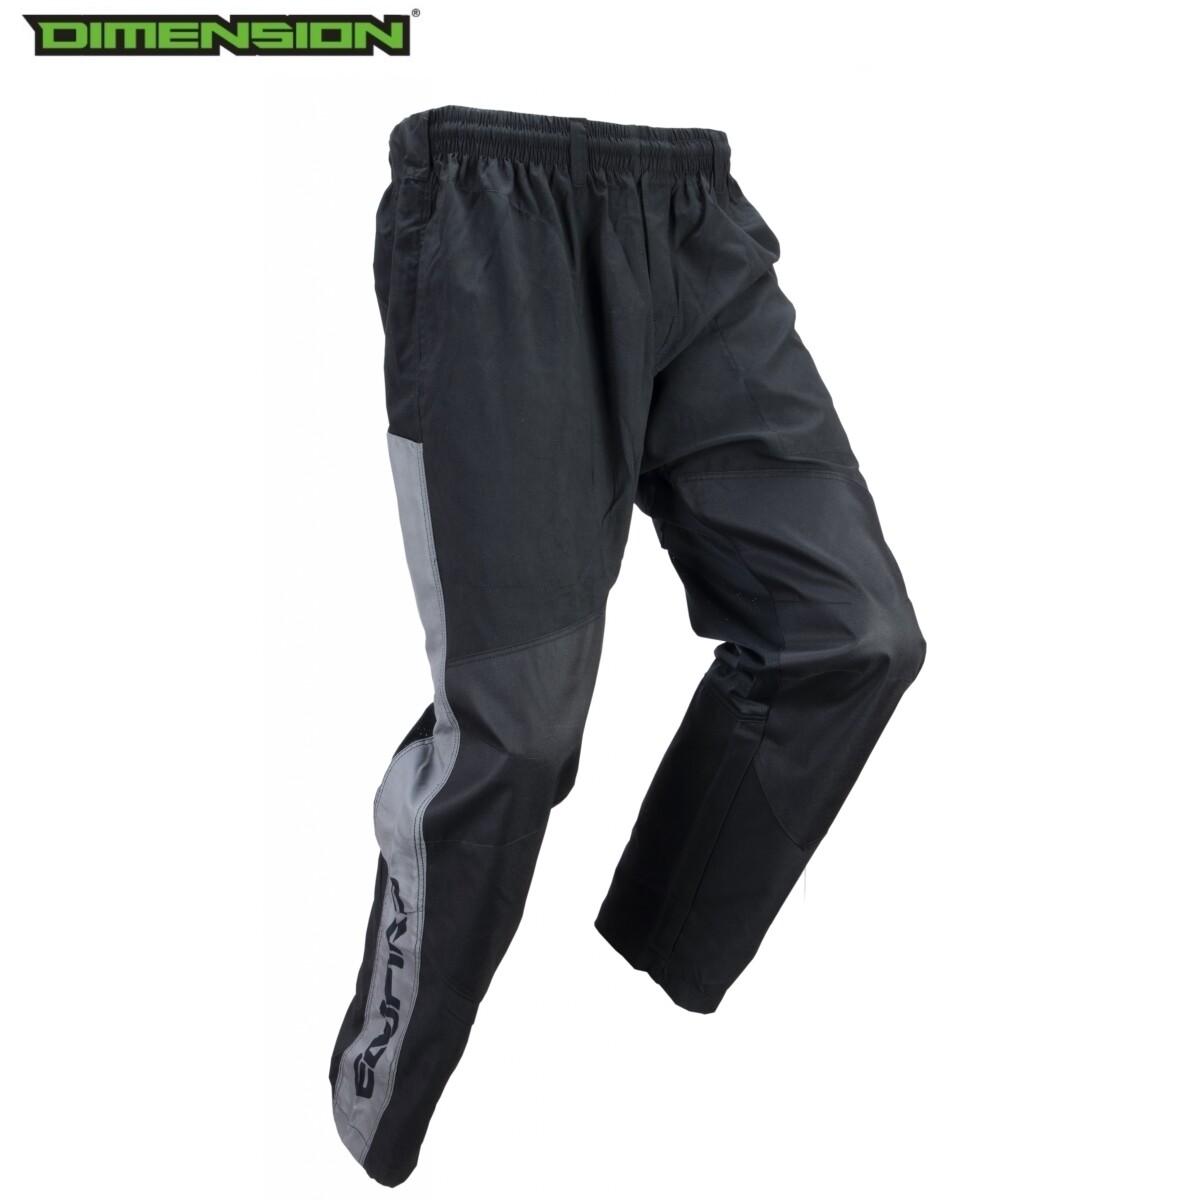 Empire Grind Pants - Black/Grey - XL